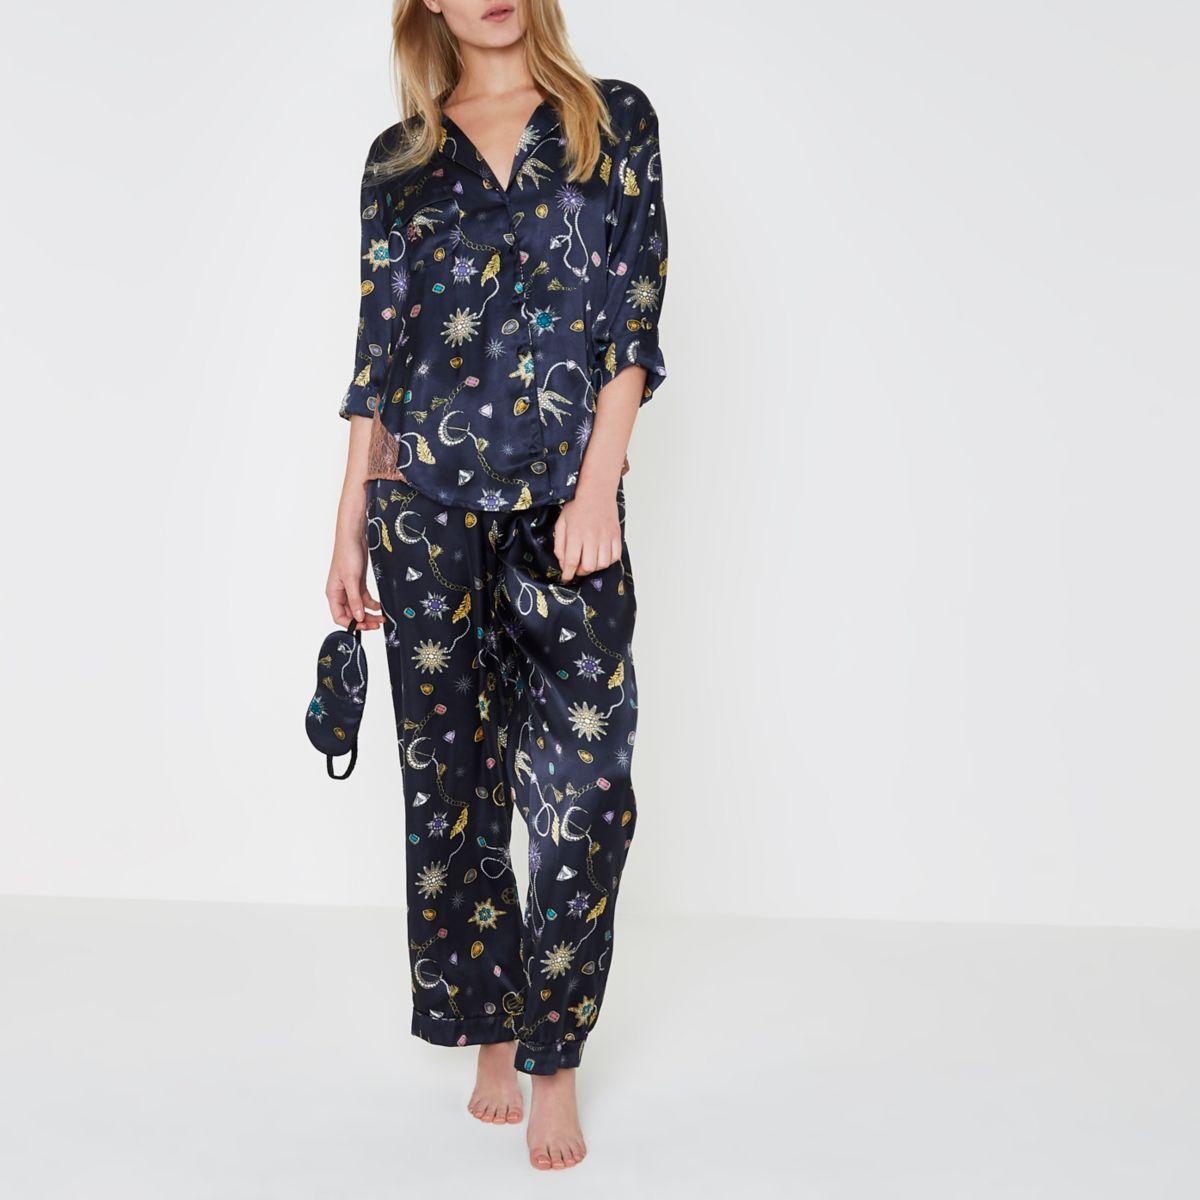 Marineblaue Pyjama-Geschenkbox